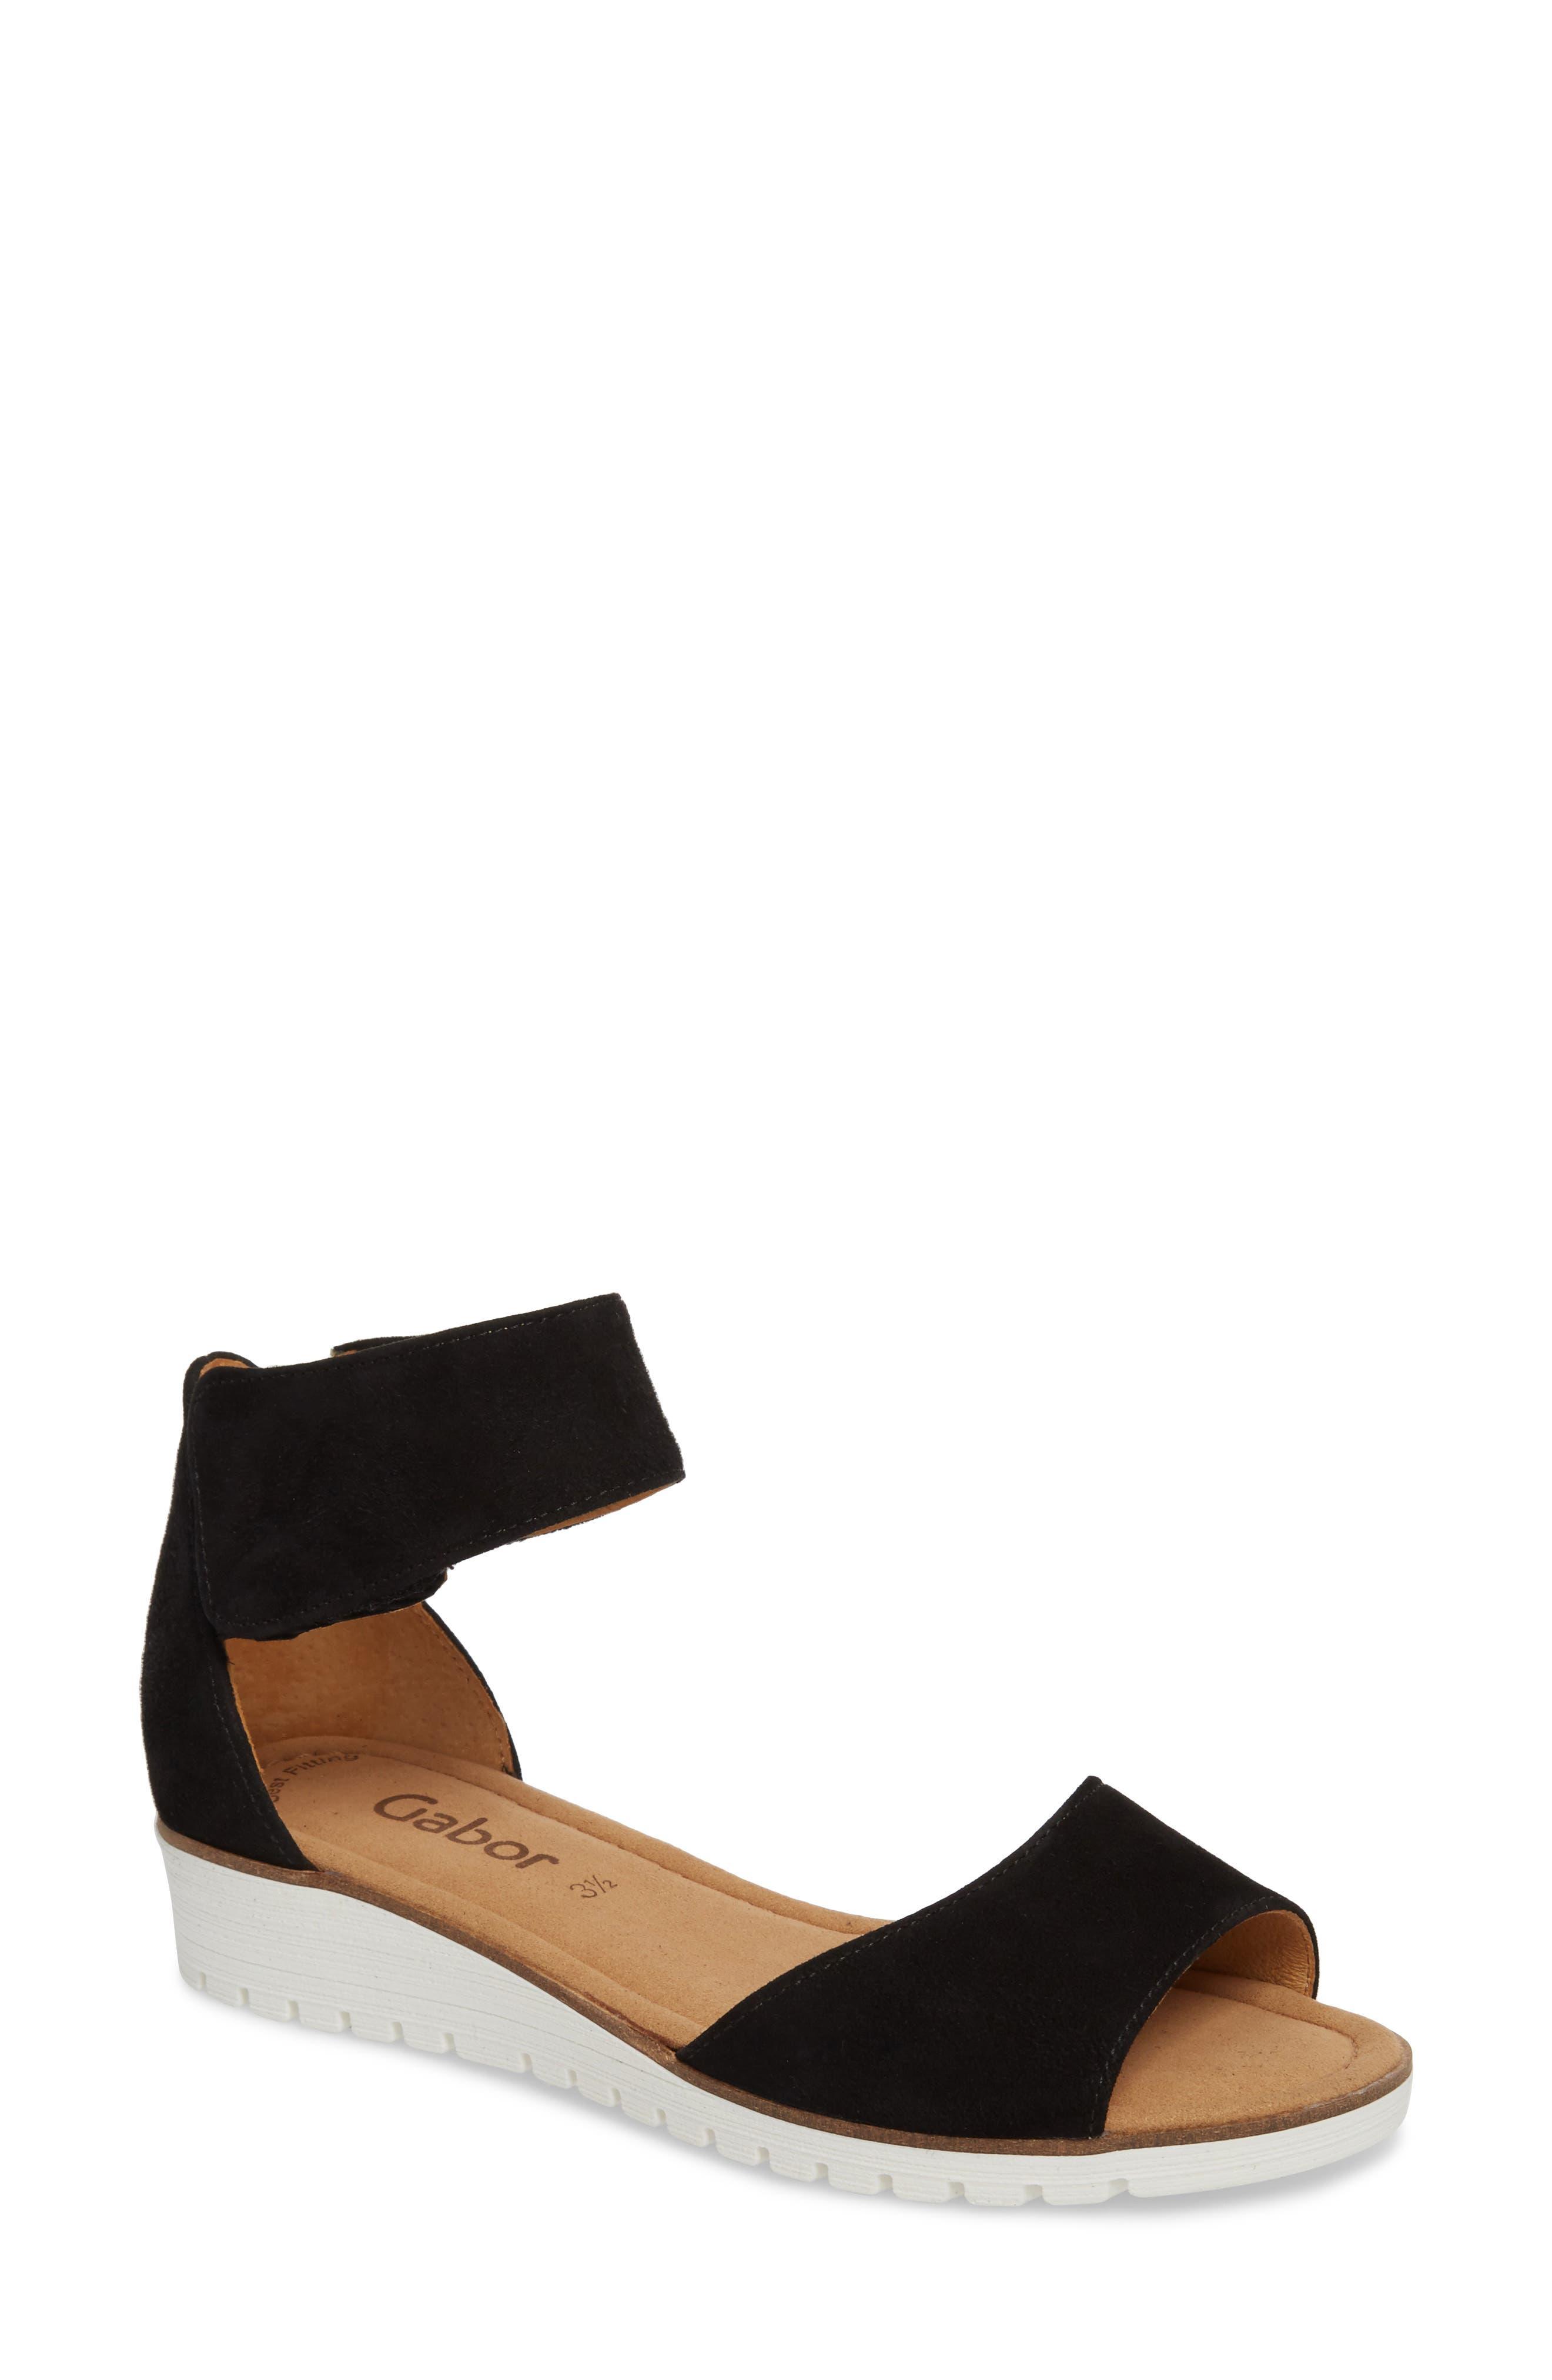 Ankle Strap Sandal,                         Main,                         color, BLACK SUEDE